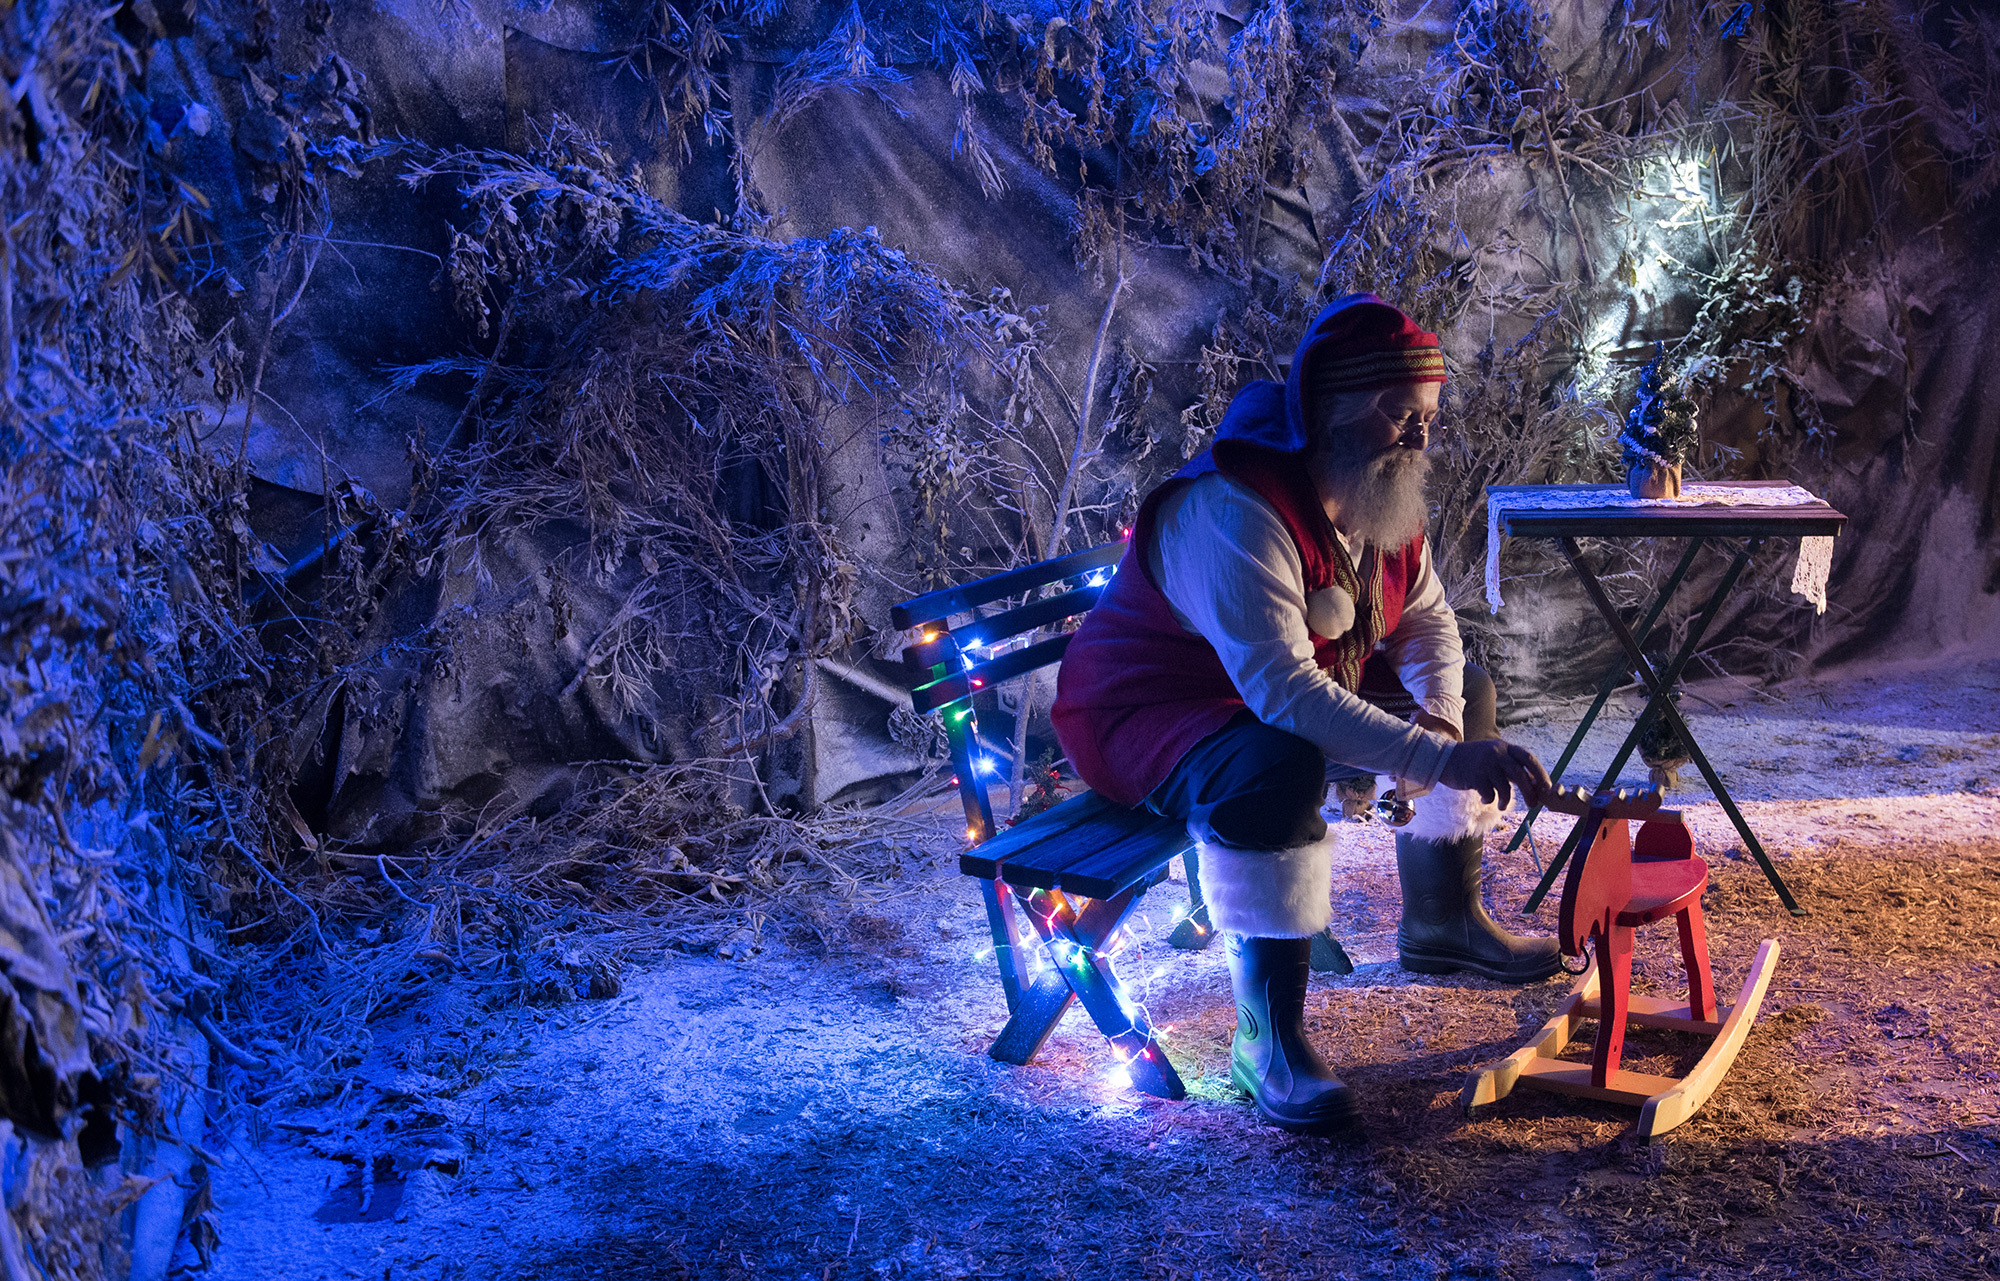 Perth Commercial and Advertising Photographers | Santa's Enchanted Wardrobe 2018